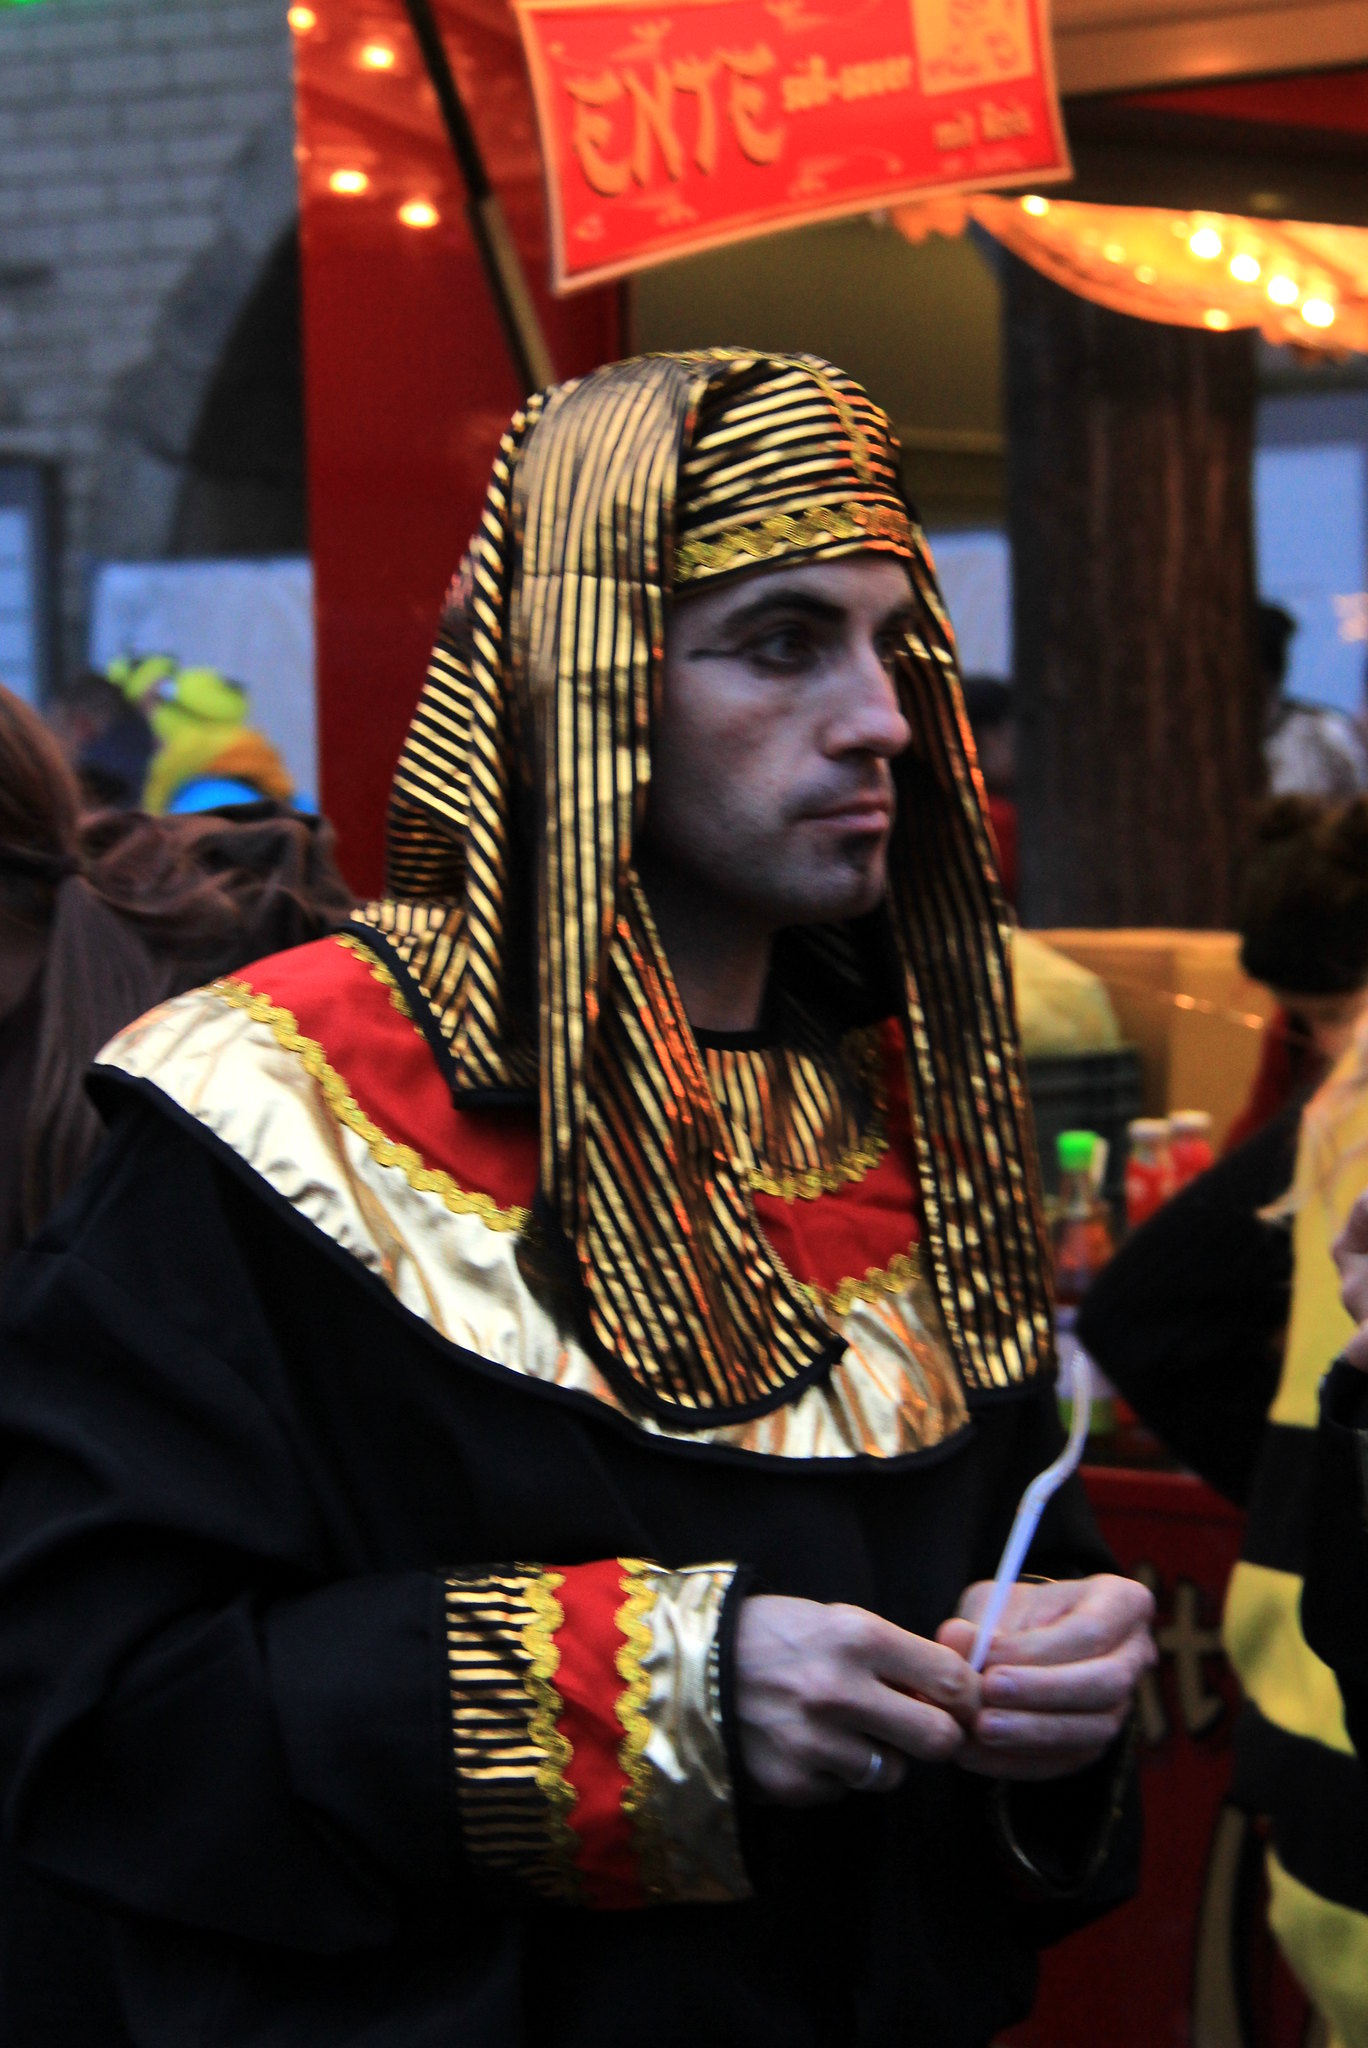 #Germany #Cologne #Travelbloggerindia #Travelblog #Germanytravelblog #Colognetourism #Colognekarnaval